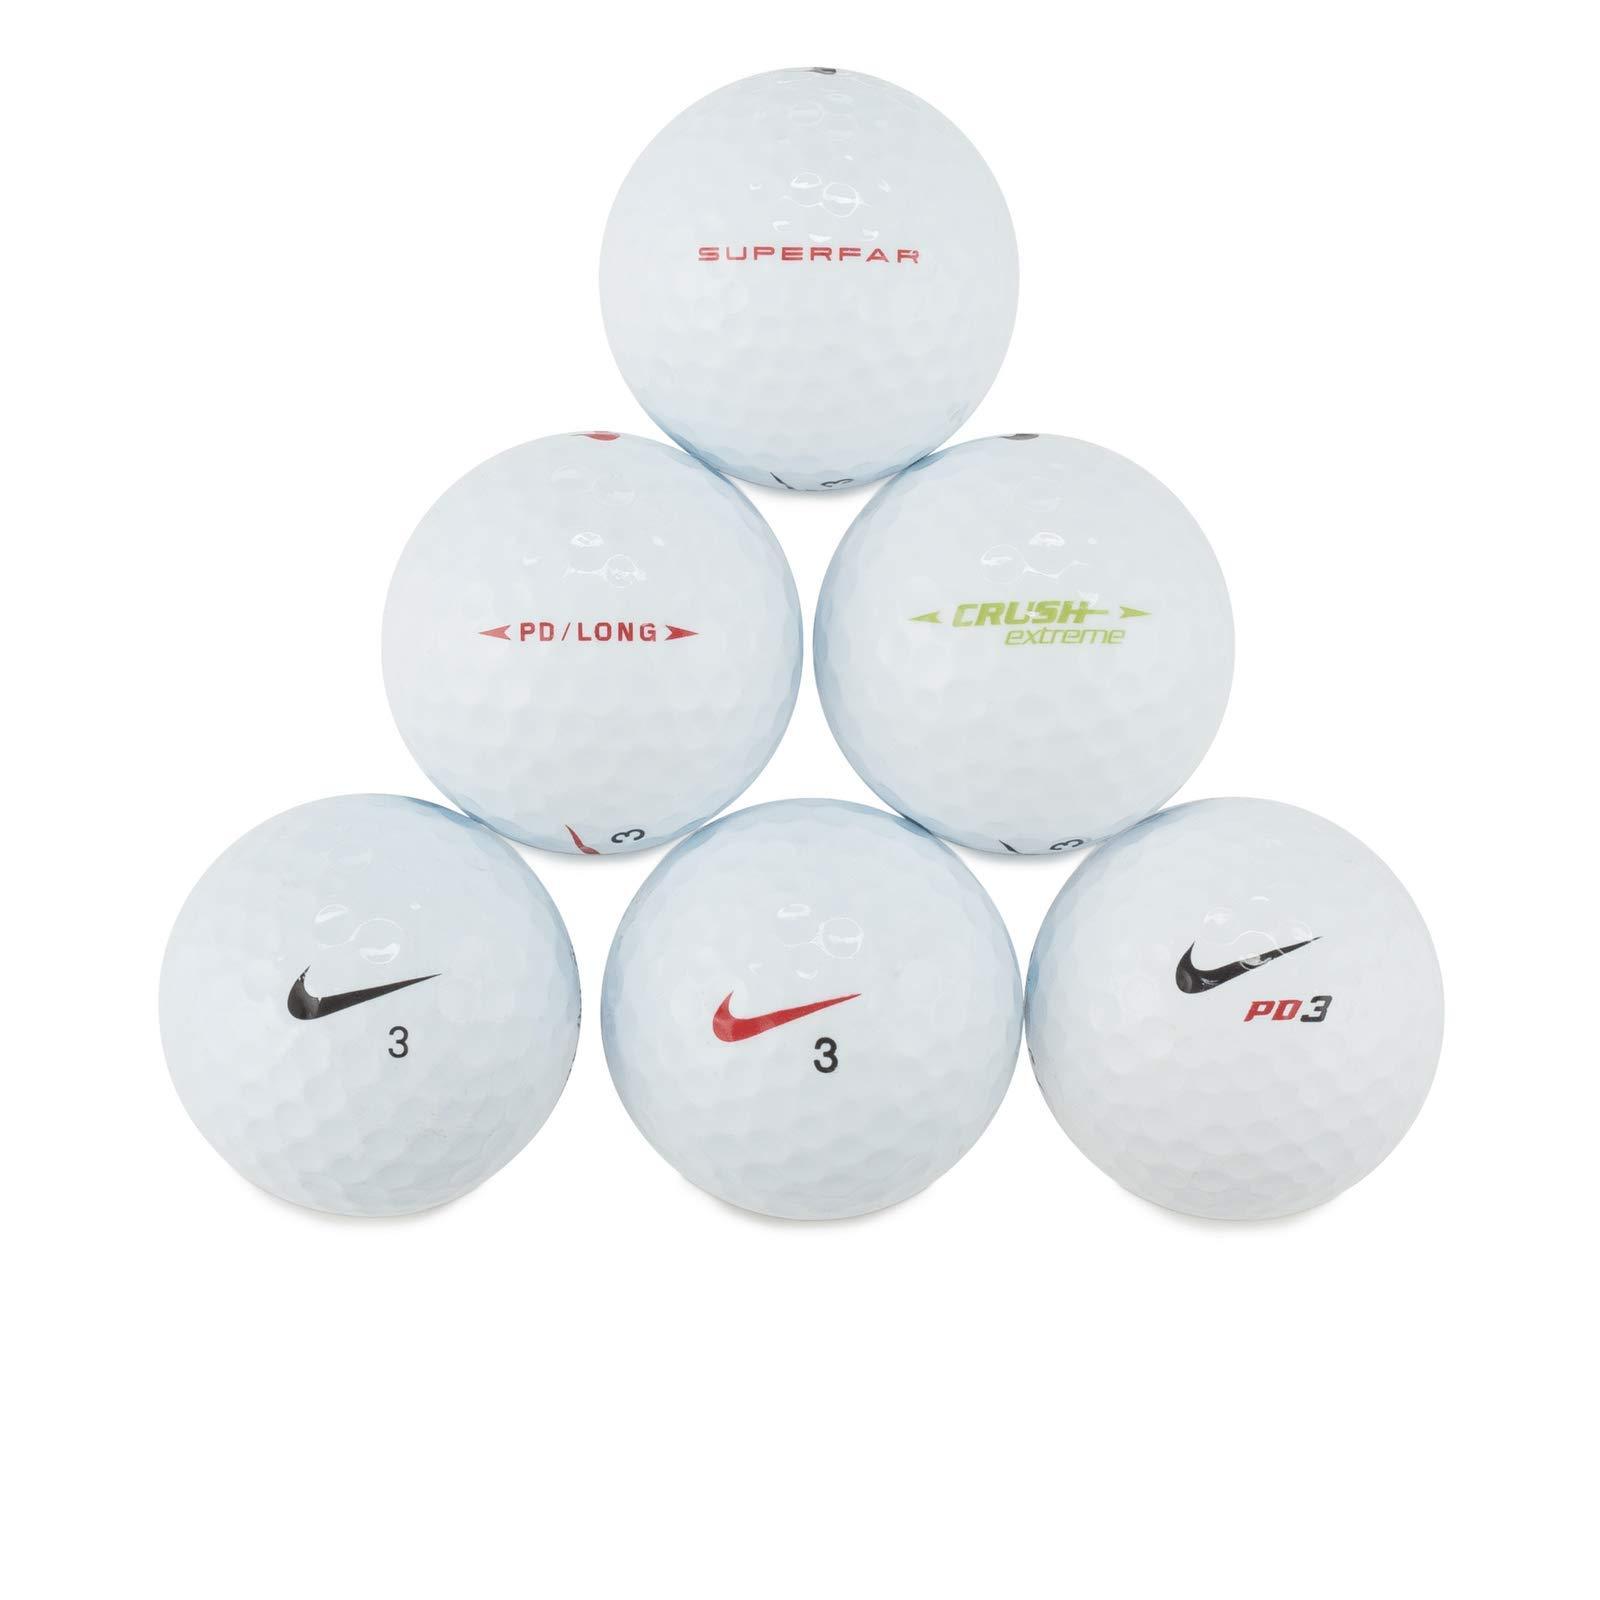 Mix AAAA Golf Balls, 50 Balls